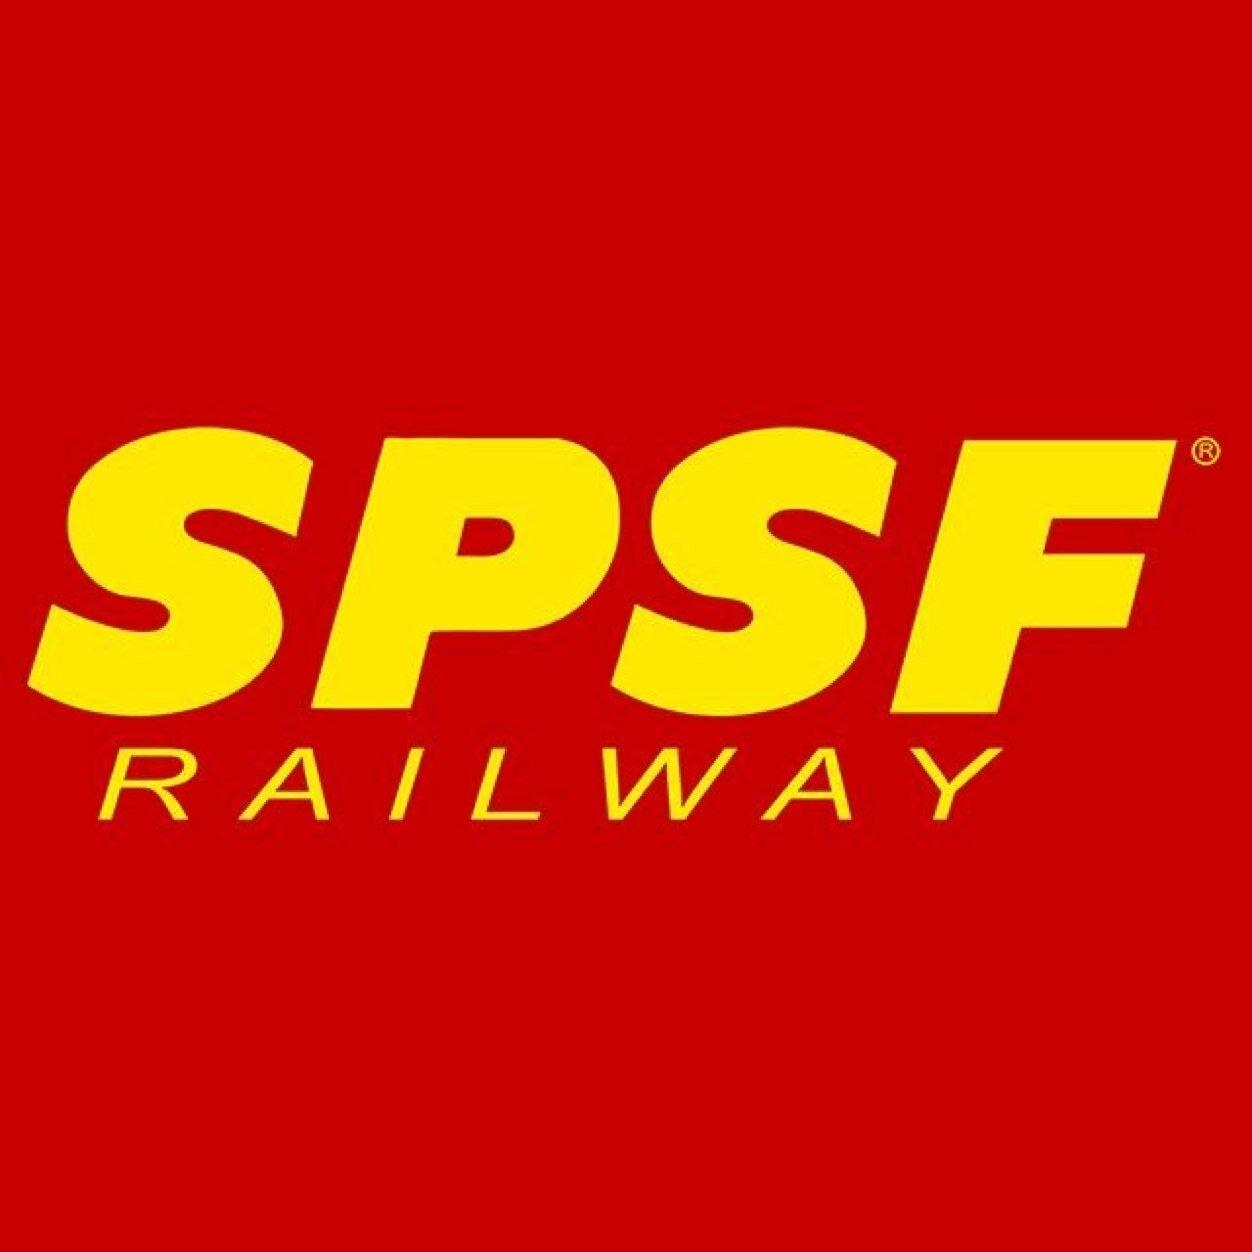 Transportation Company - Southern Pacific & Santa Fe - Railroad